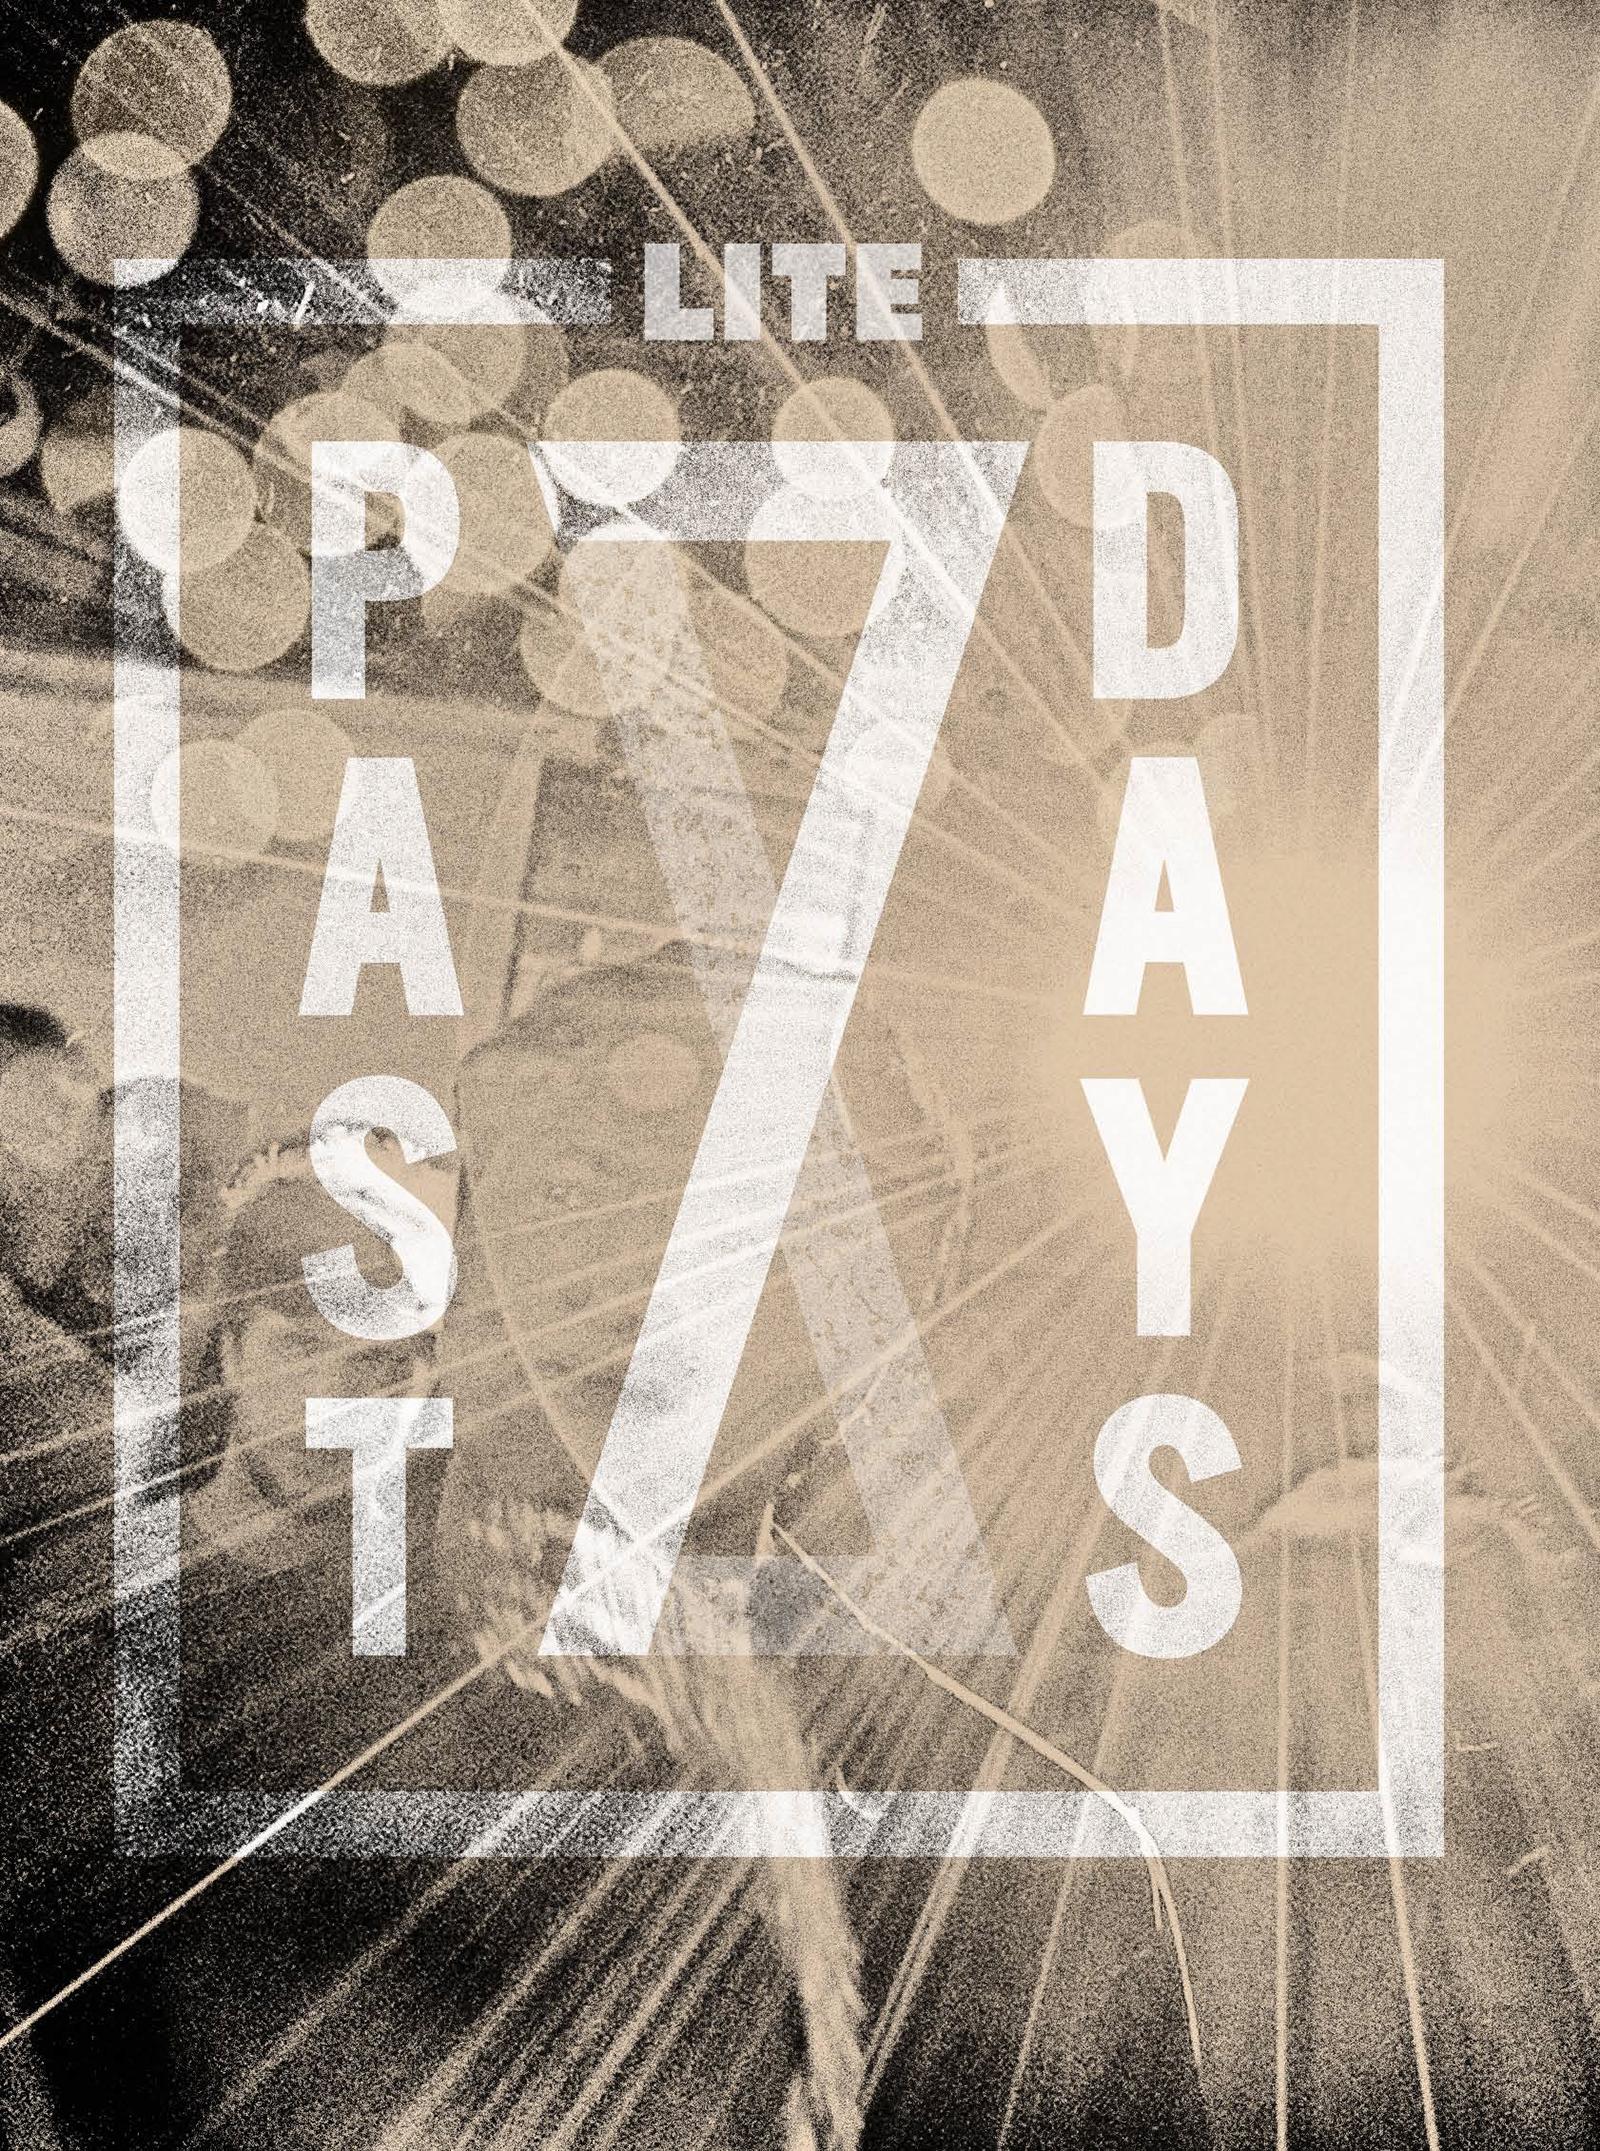 Past 7 Days